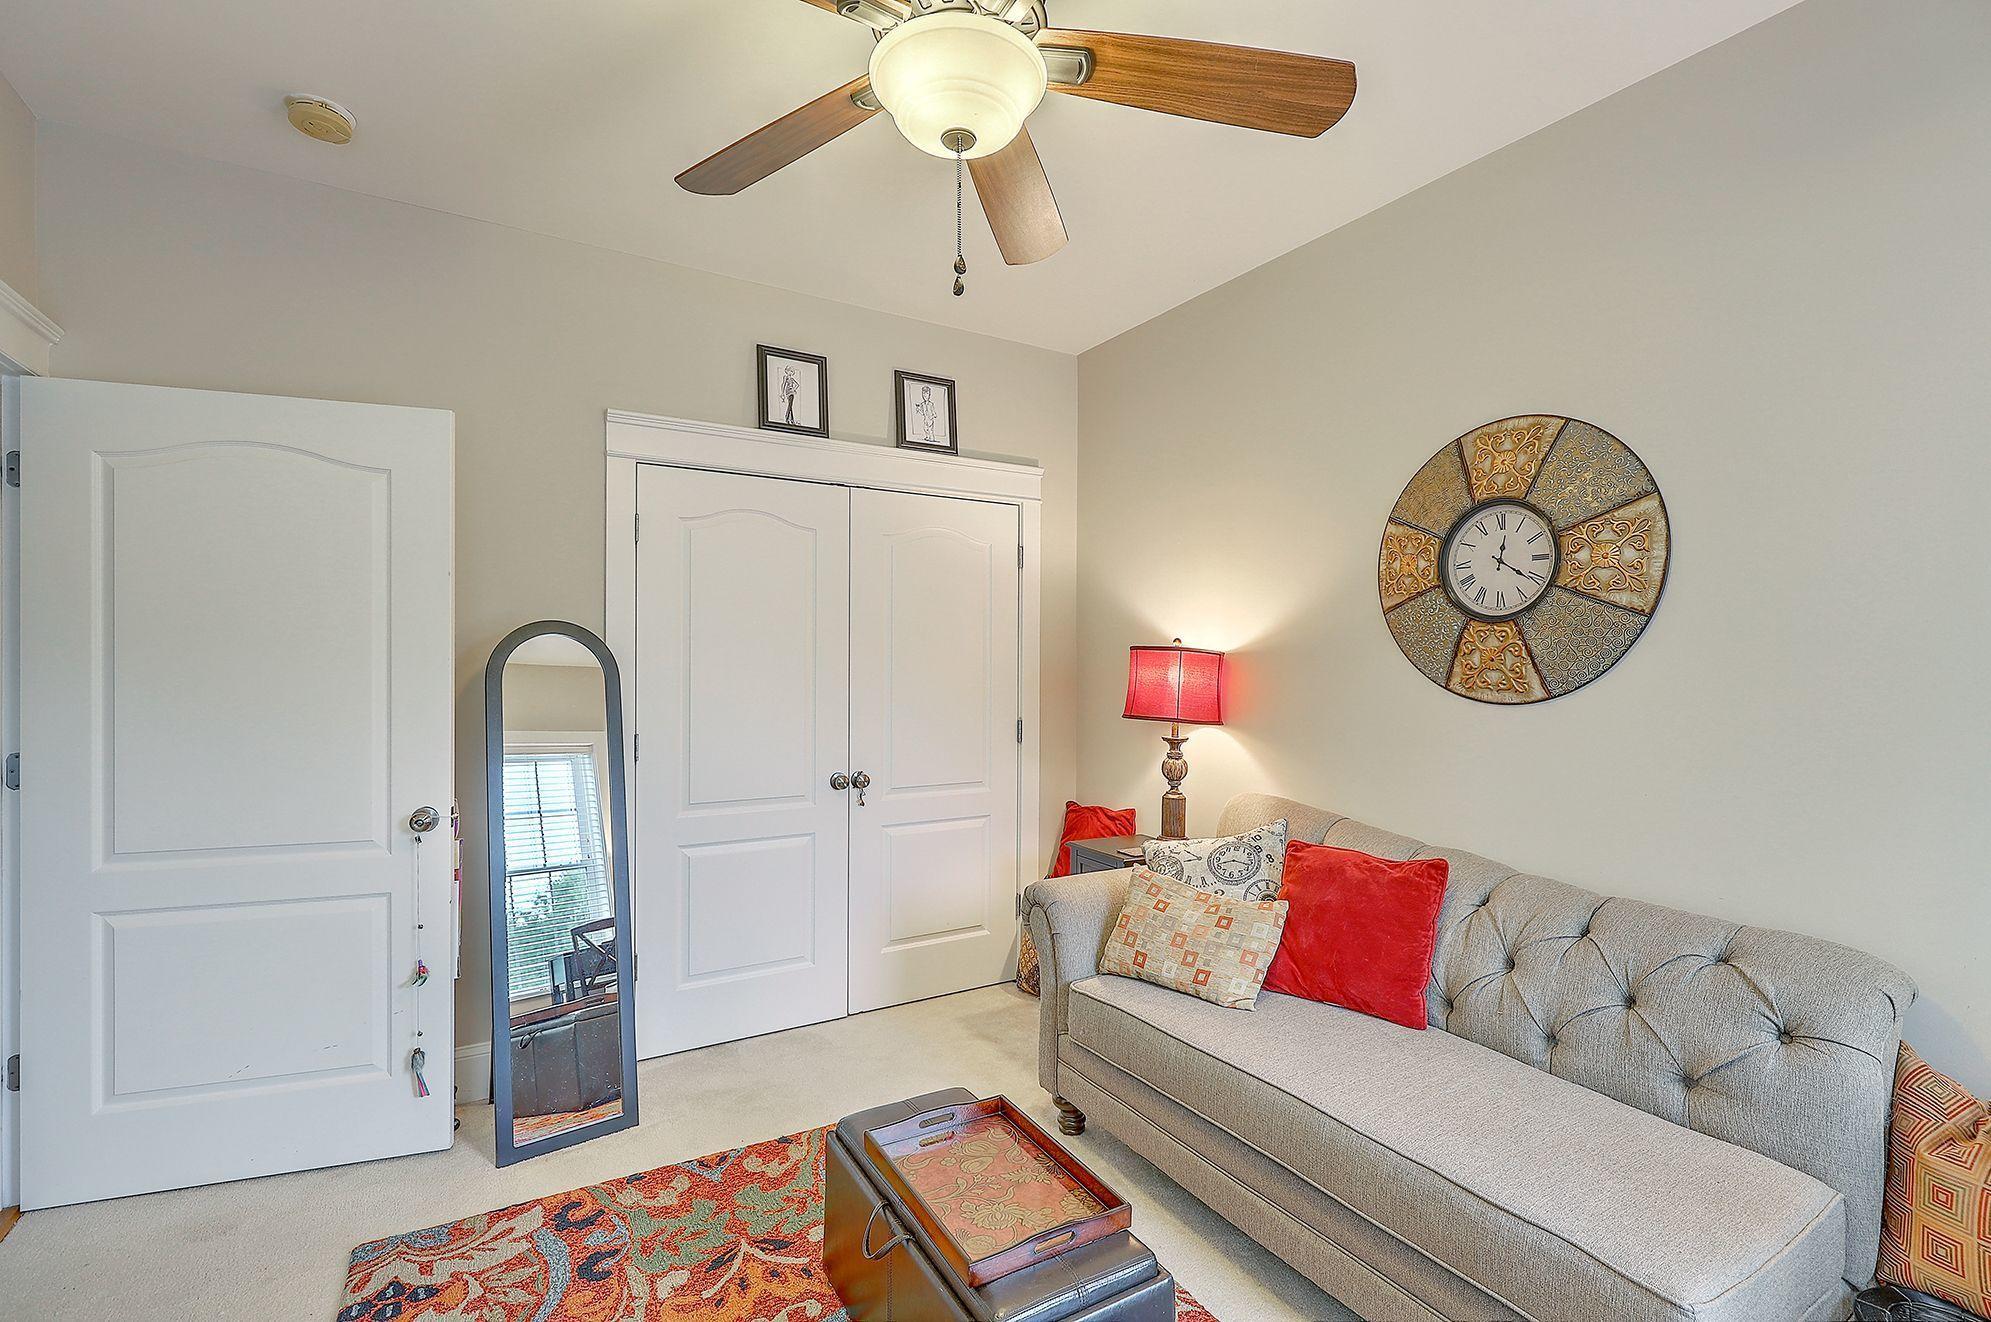 Etiwan Pointe Homes For Sale - 208 Etiwan Pointe, Mount Pleasant, SC - 40